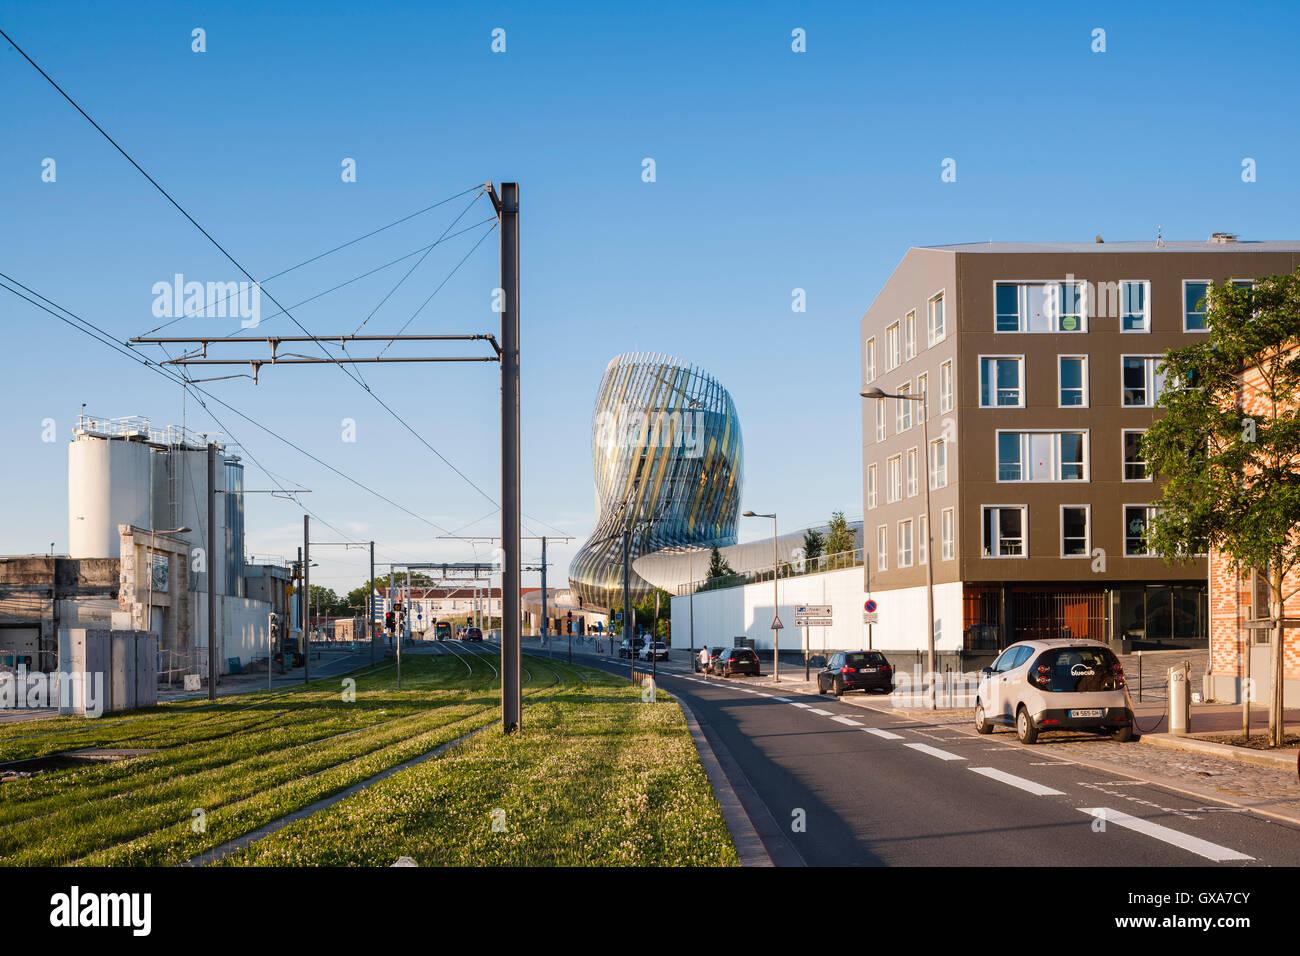 Exterior afternoon shot as seen form the approach showing tram rails and housing. La cité du vin / The City - Stock Image